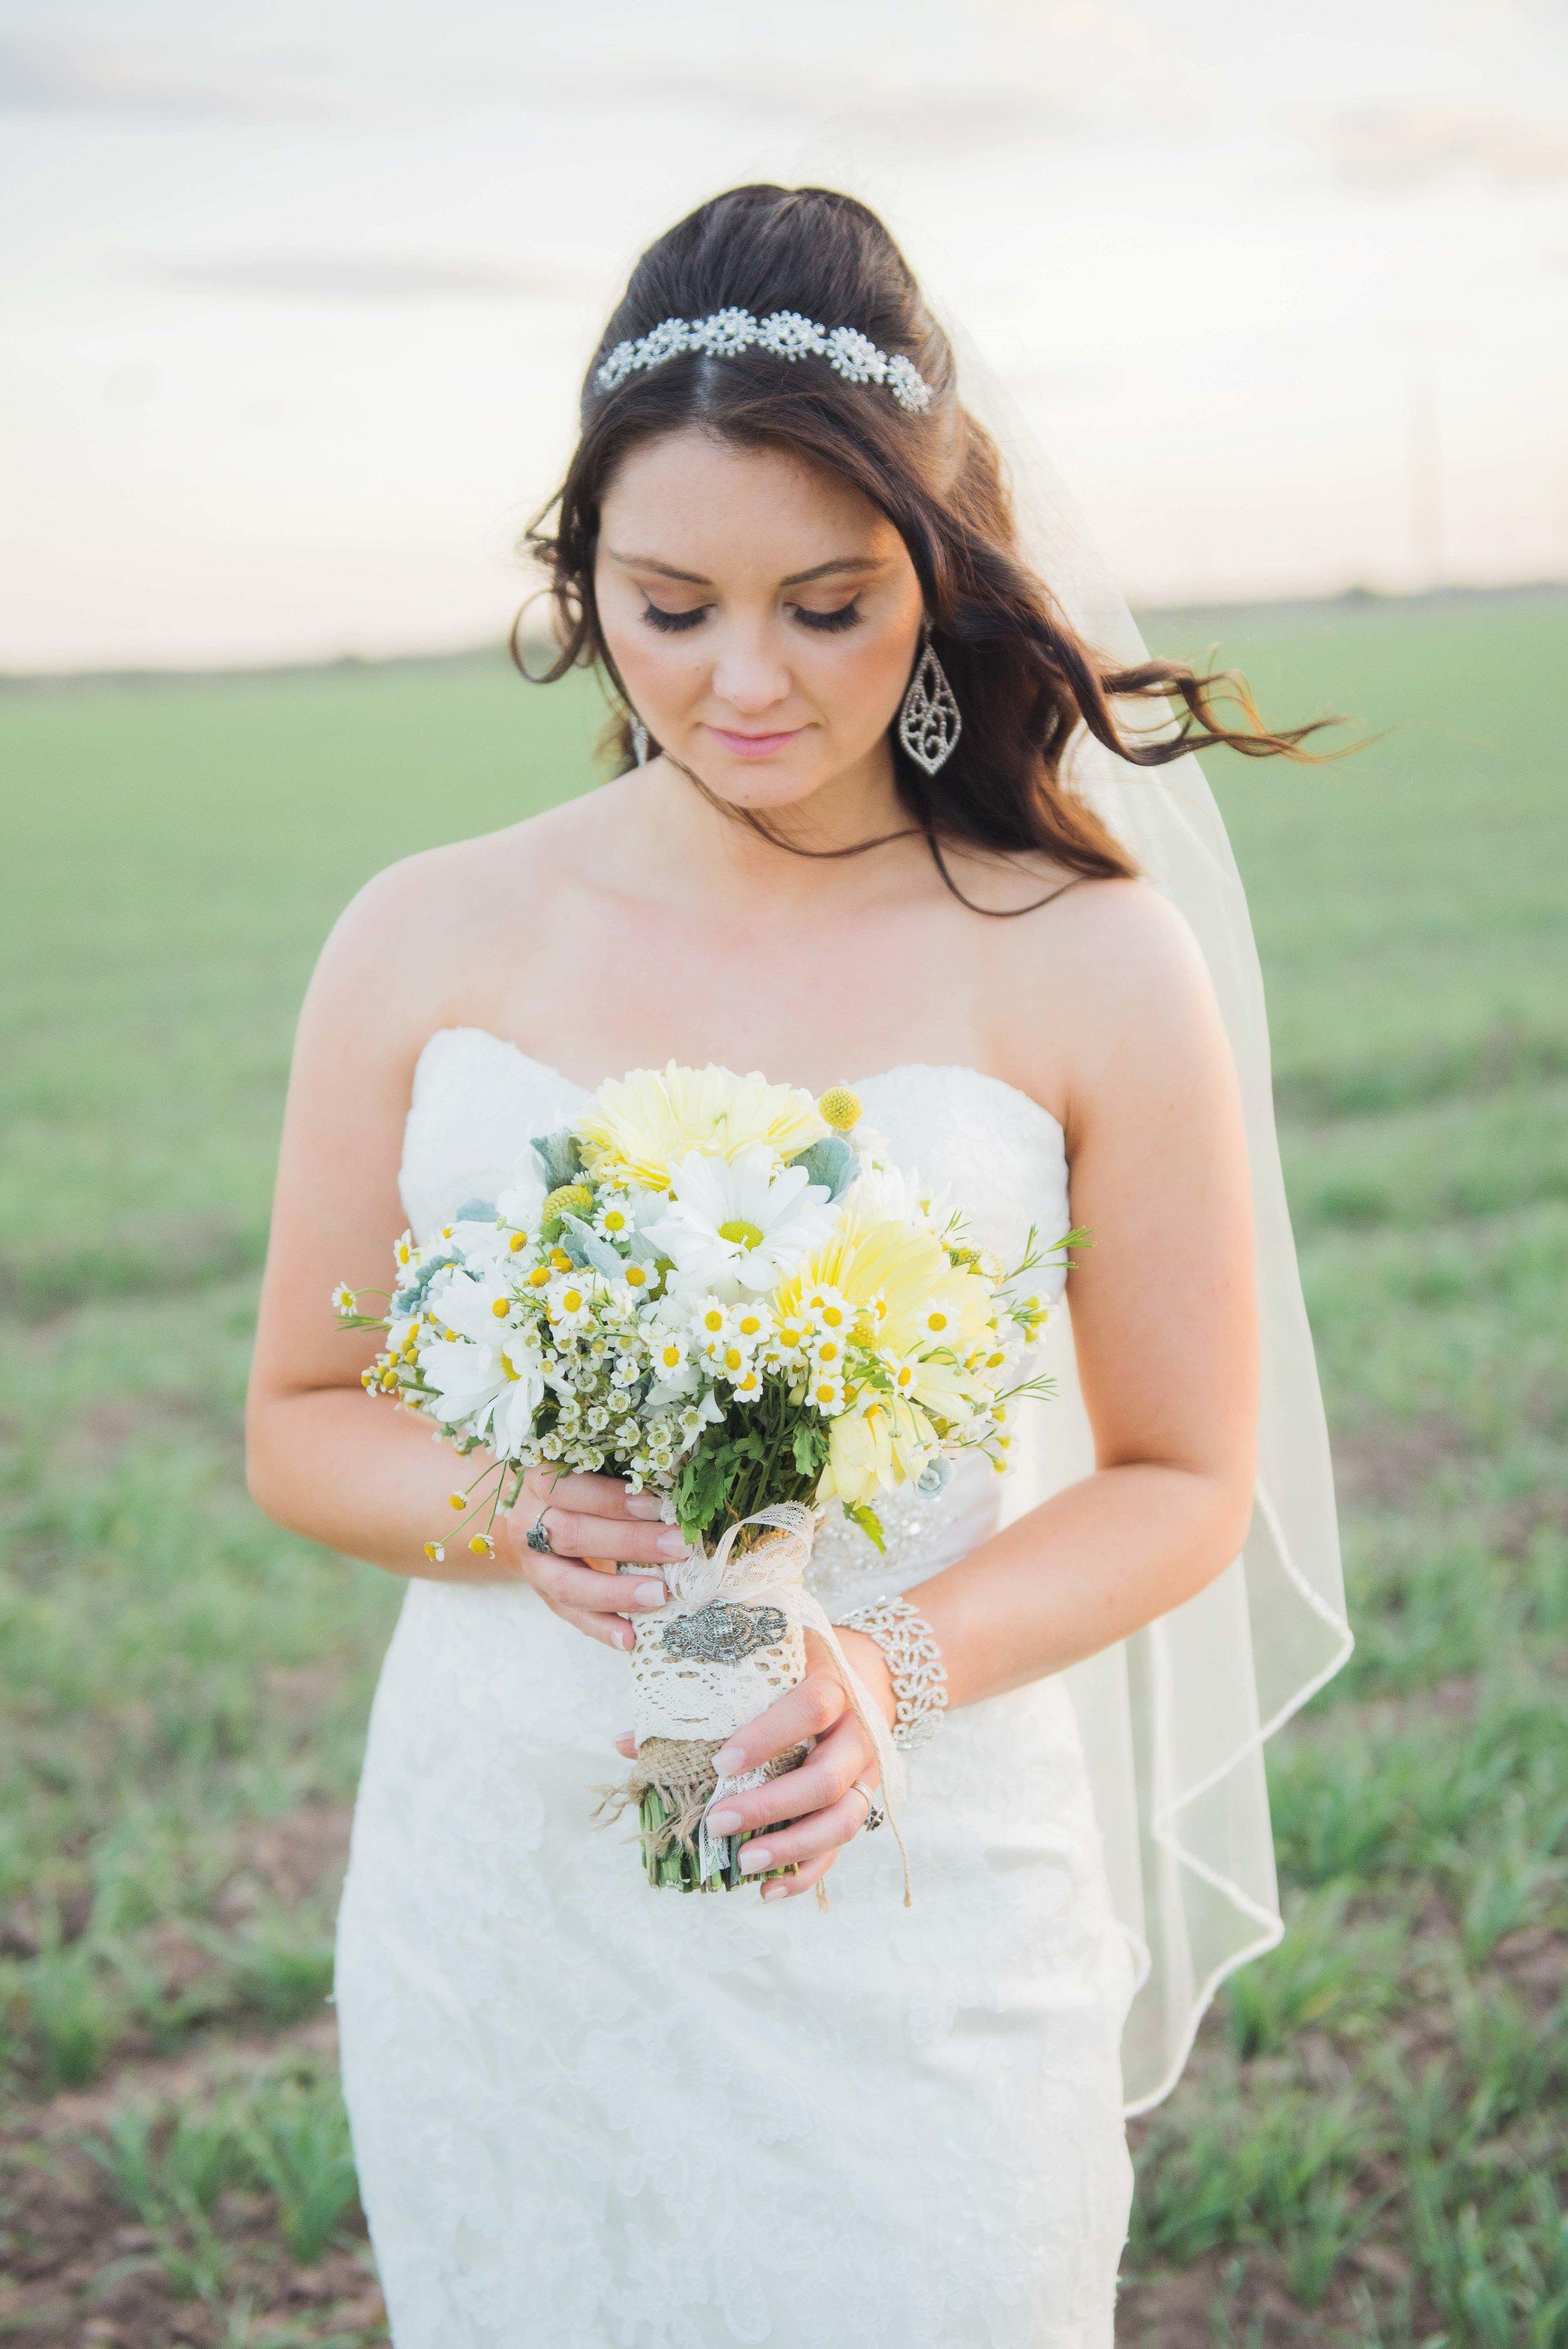 weddingwebsitesmallerpics-108.jpg